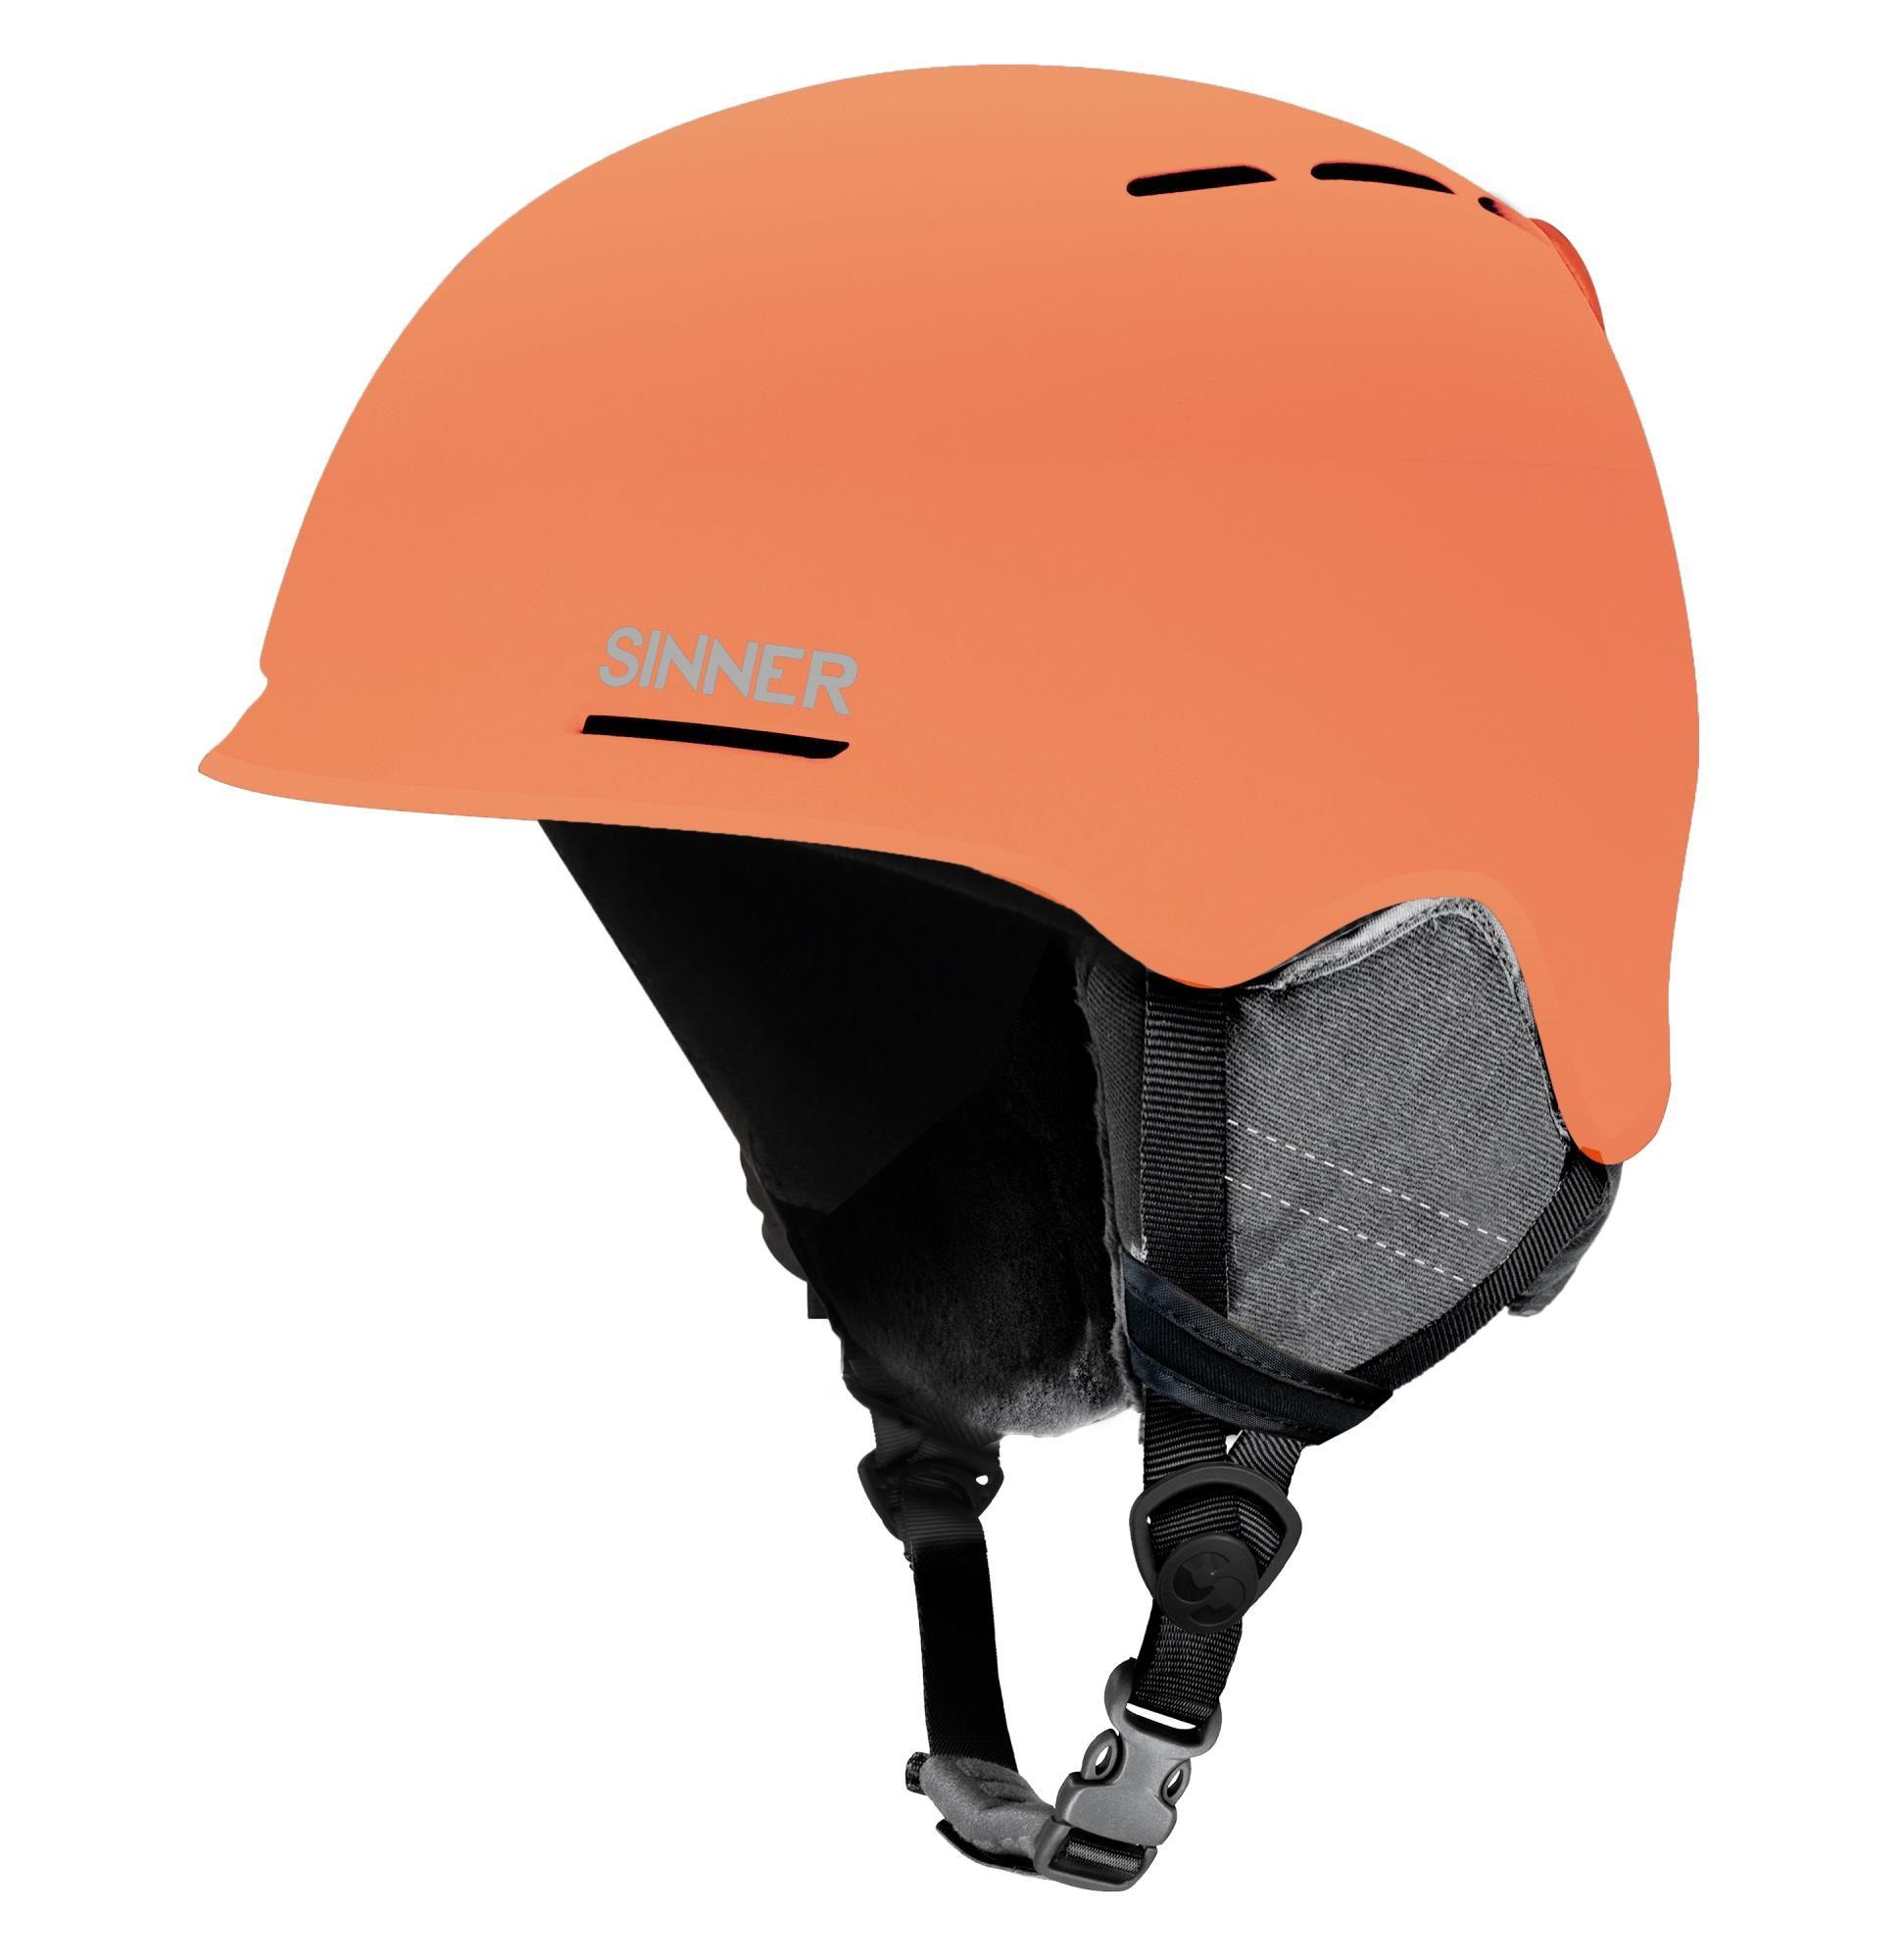 Sinner Fortune Skihelm - Mat Neon Oranje - Maat M - 57